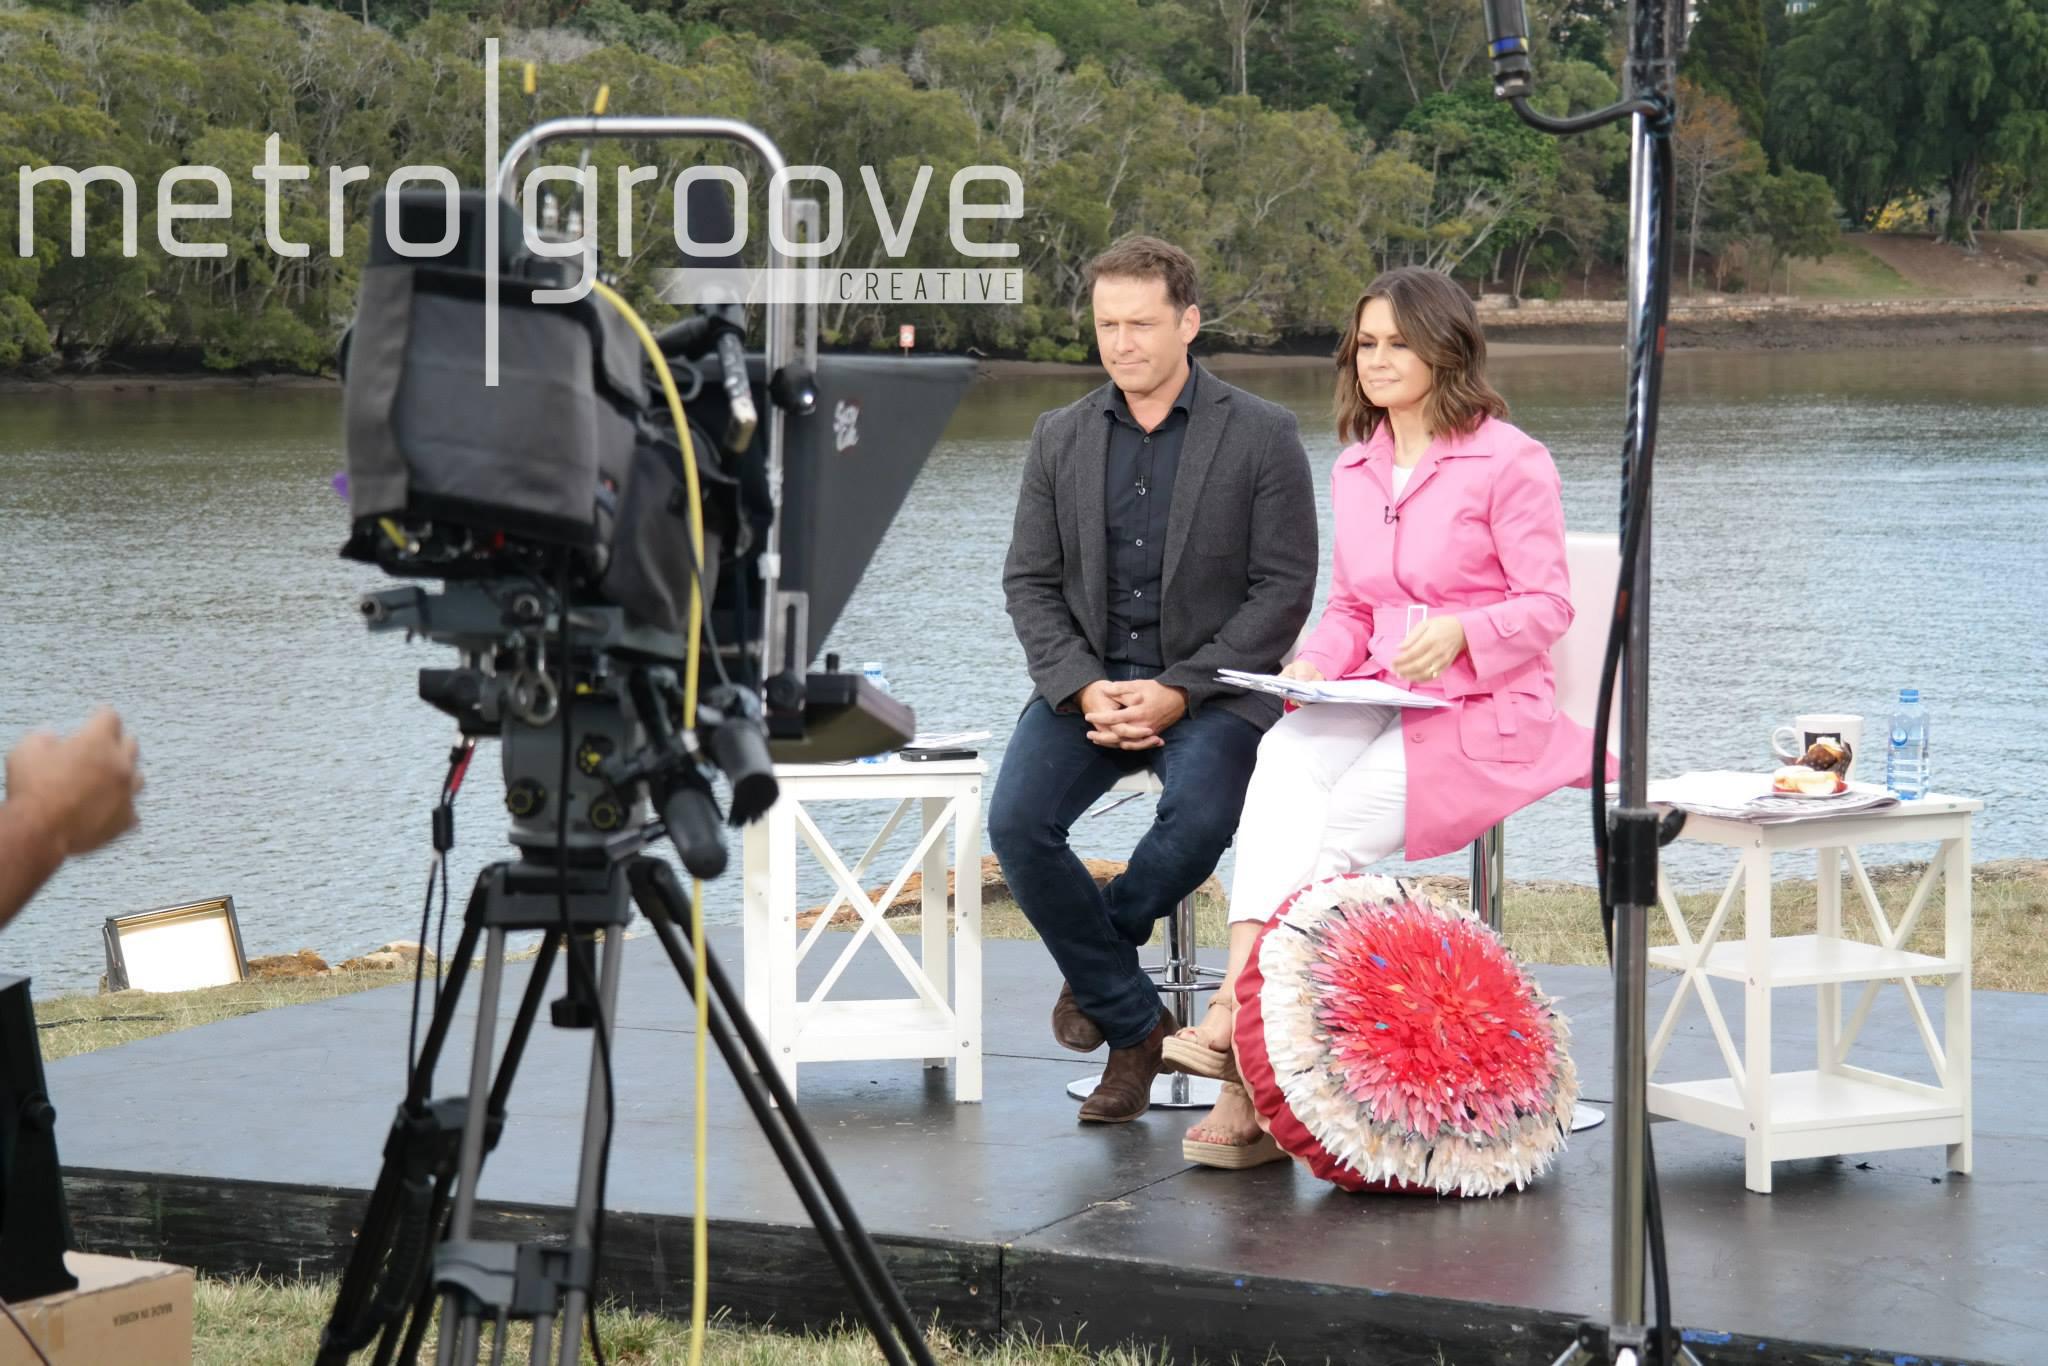 Photography Brisbane events